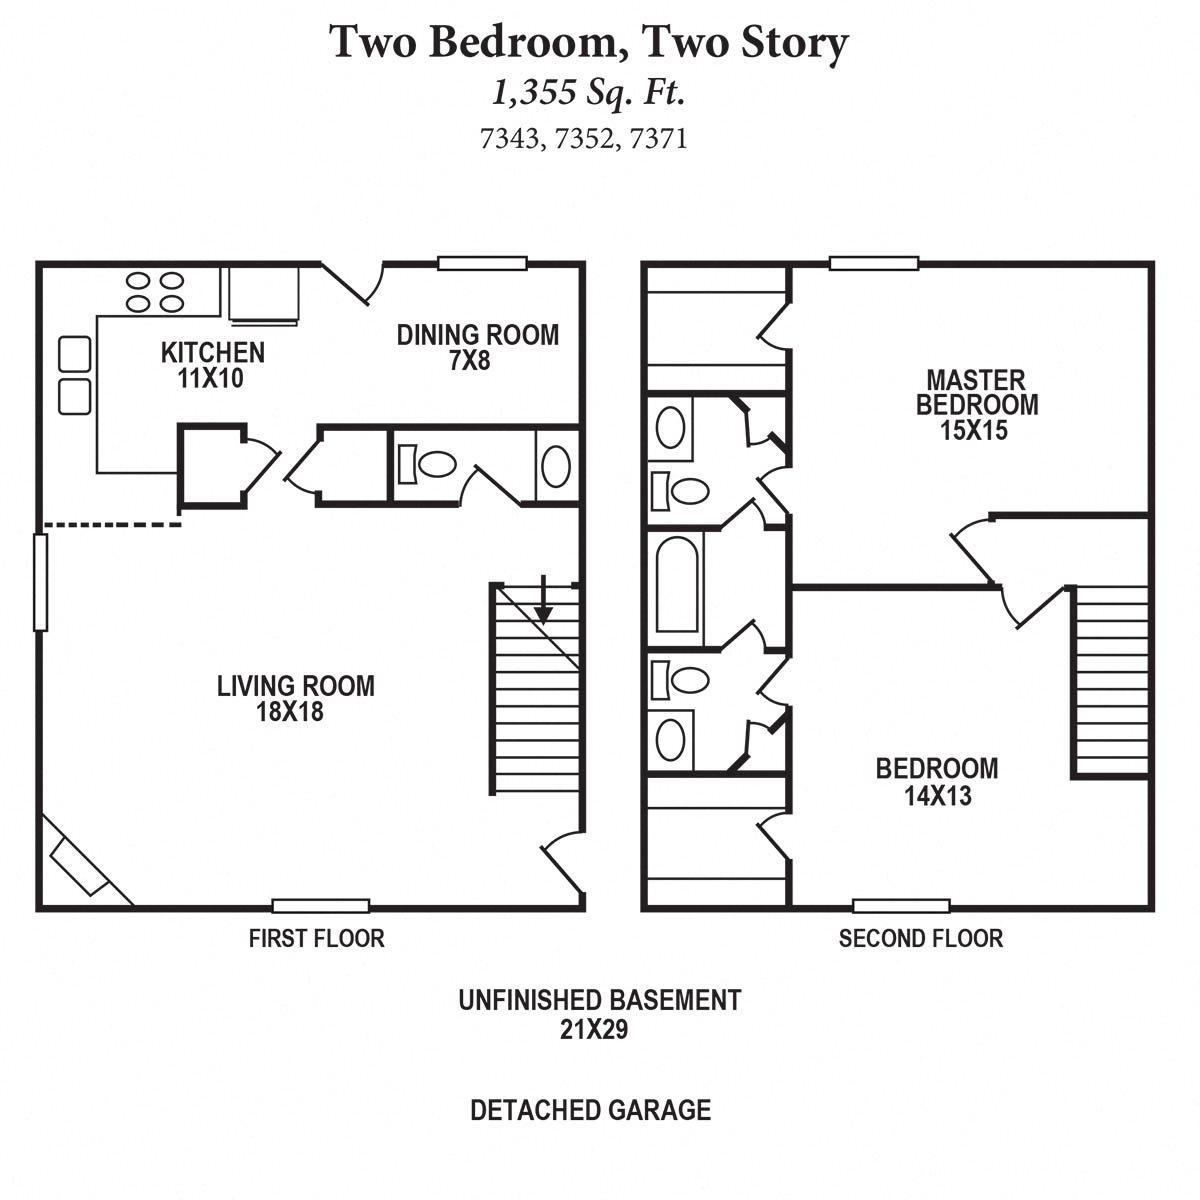 Floor Plans of The Villas at Kingswood in West Chester, OH on 16x16 floor plan, 10x13 floor plan, 6x8 floor plan, 12x10 floor plan, 14x14 floor plan, 14x12 floor plan, 13x13 floor plan, 15x15 floor plan, 8x12 floor plan, 12x12 floor plan, 12x24 floor plan, 12x18 floor plan, 10x12 floor plan, 15x20 floor plan, 10x20 floor plan, 16x26 floor plan, 24x30 floor plan, 7x7 floor plan, 10x18 floor plan, 14x16 floor plan,